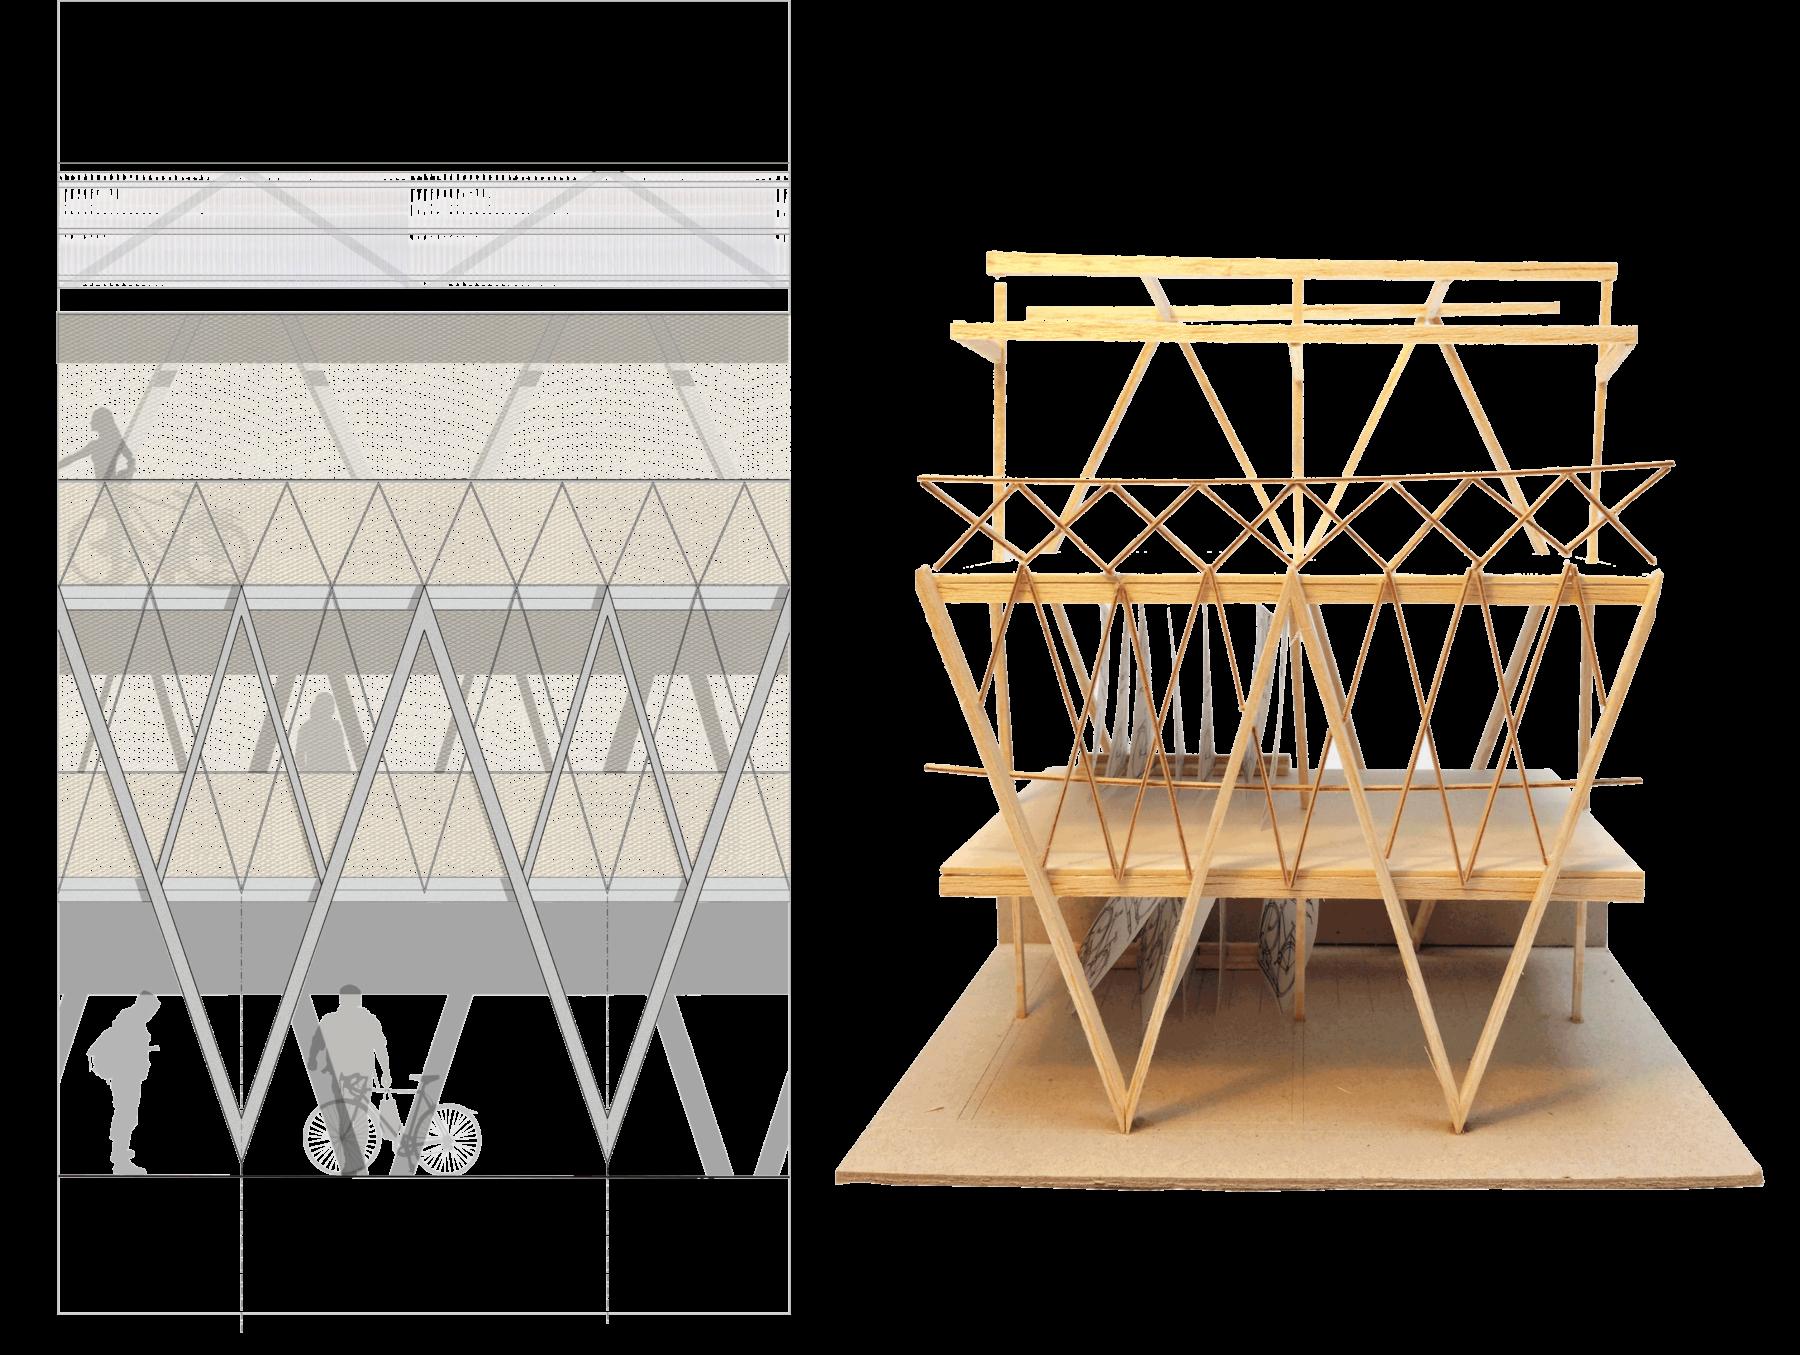 Sarah-Wigglesworth-Architects Kingston-Mini-Holland Hub 4 Model 3600